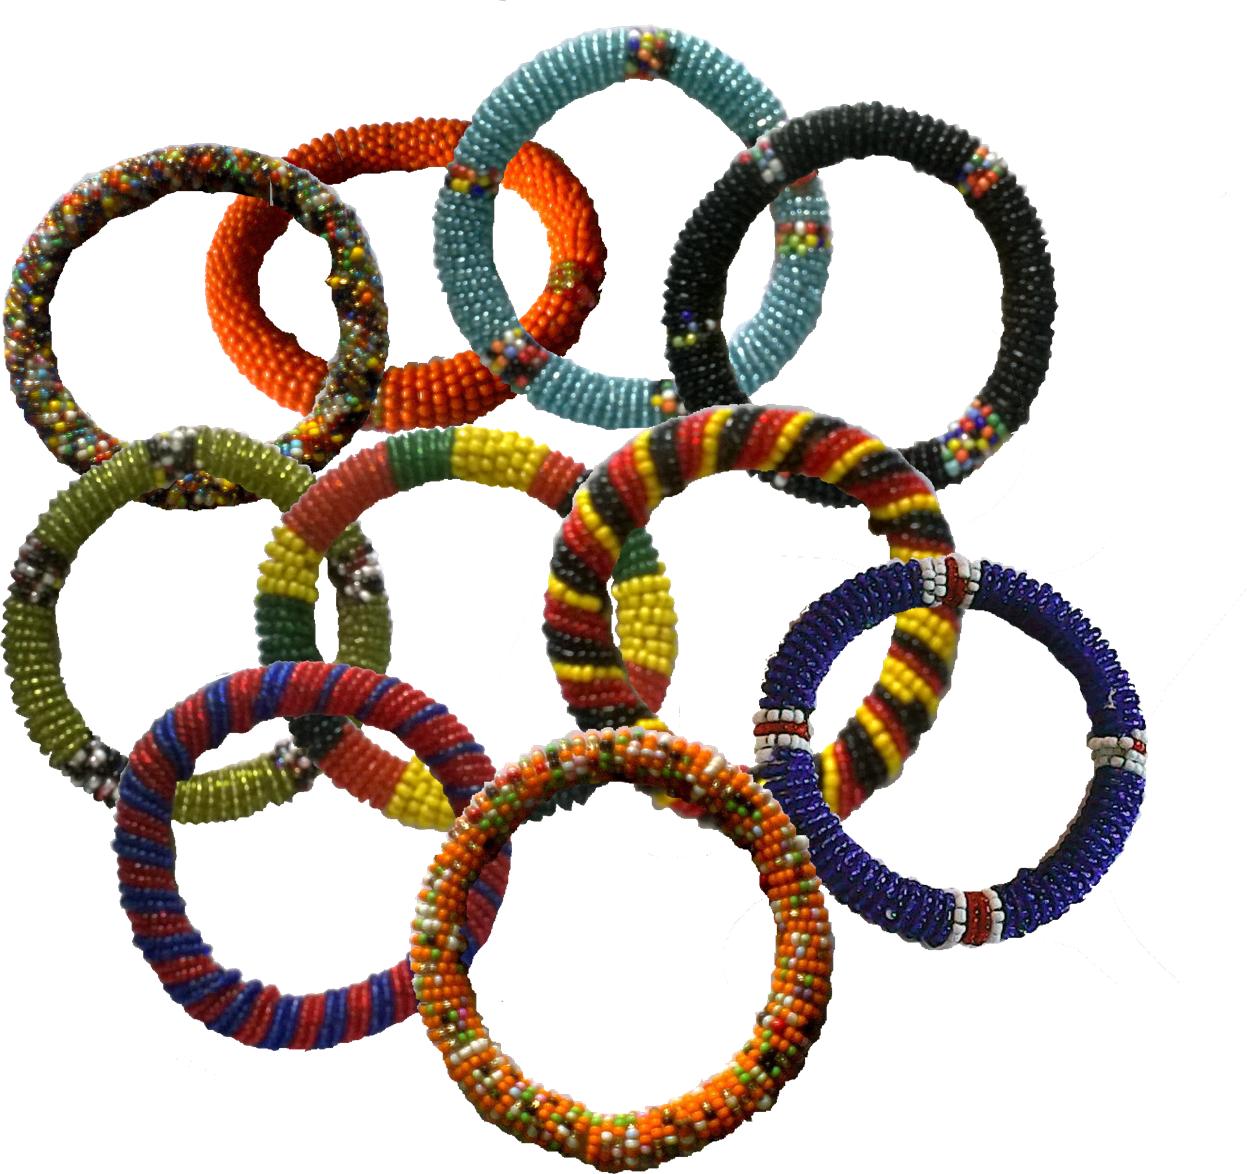 10 pieces Masai beads bracelets-MBB002